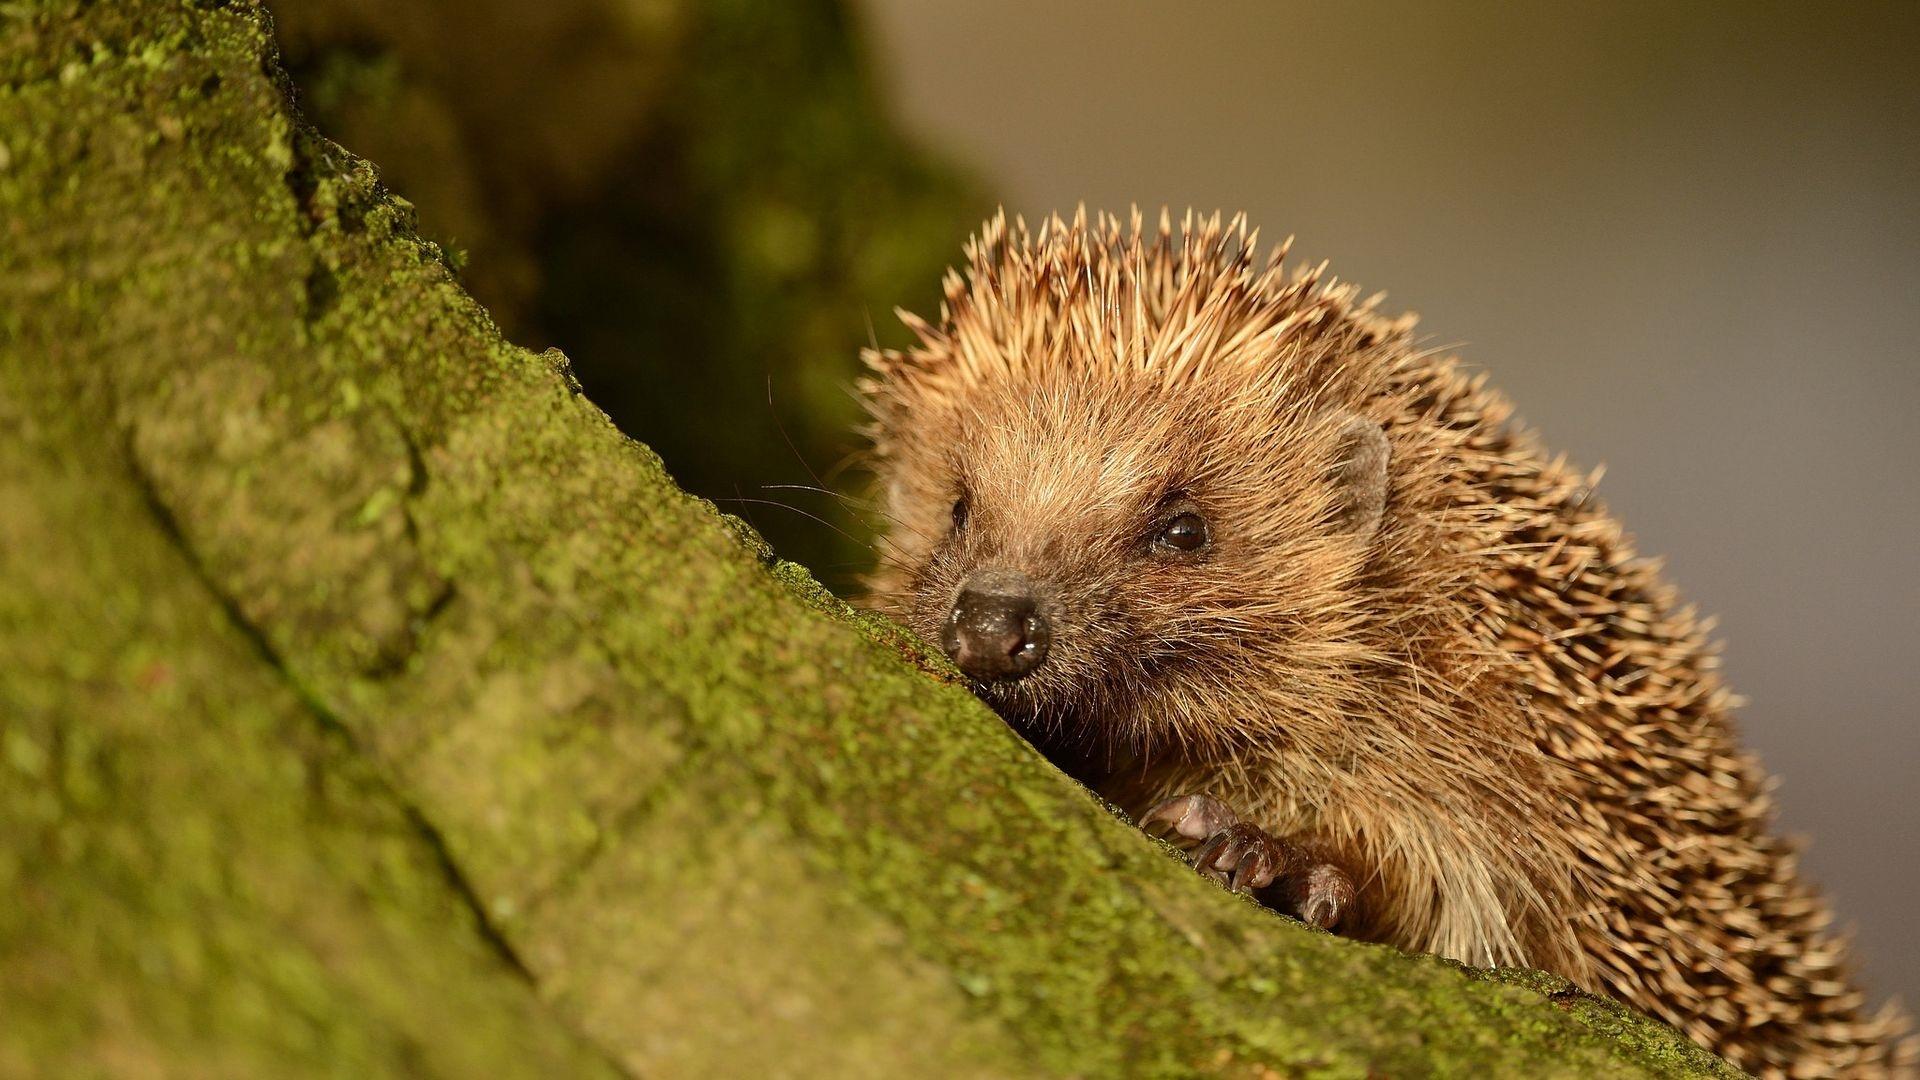 Hedgehog Wallpaper theme